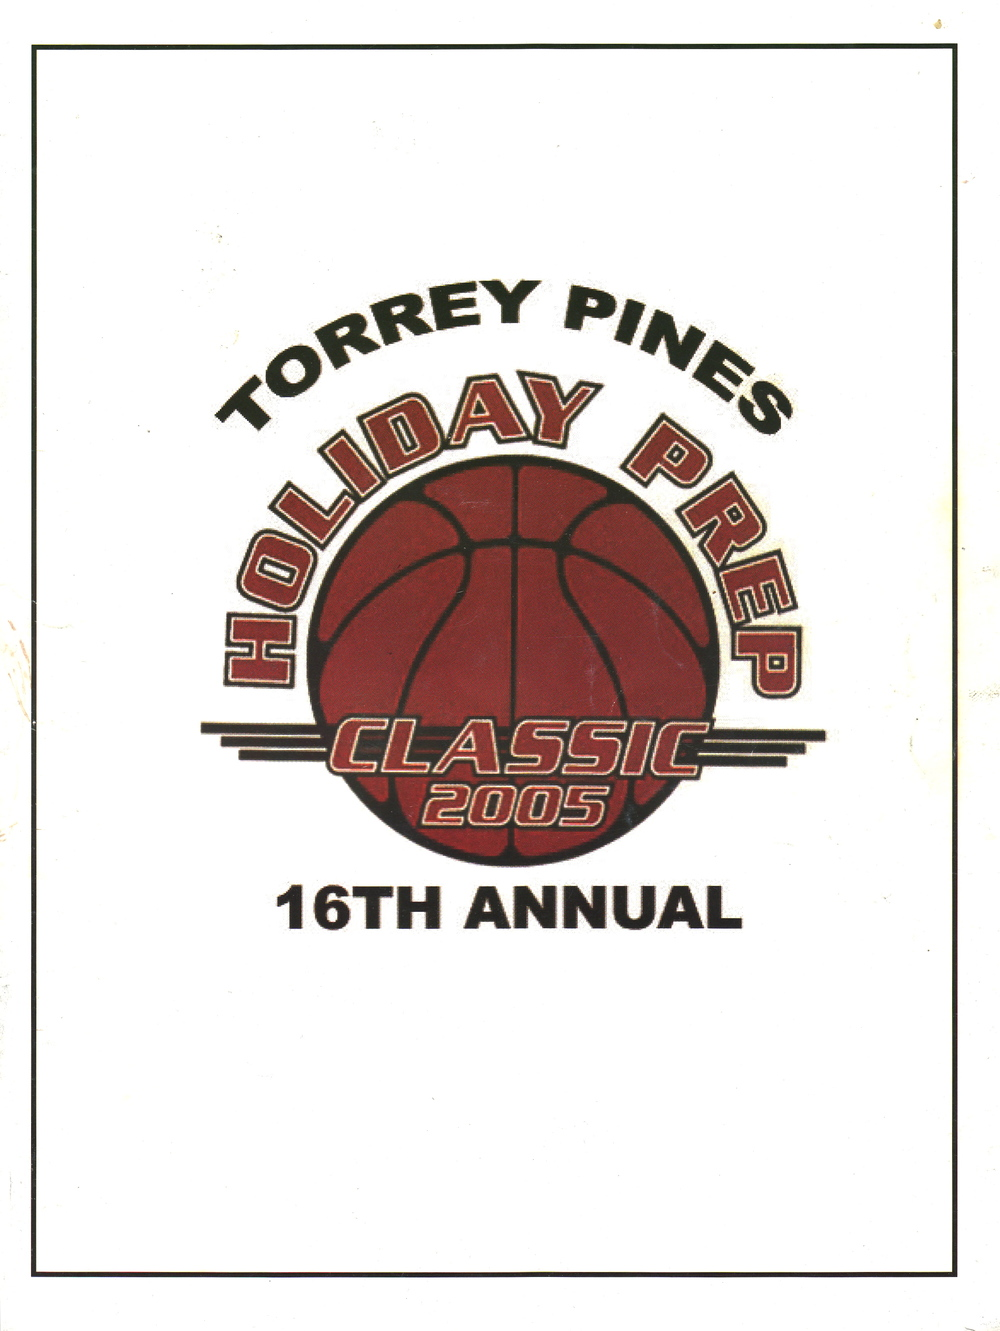 TorreyPines2005.jpg